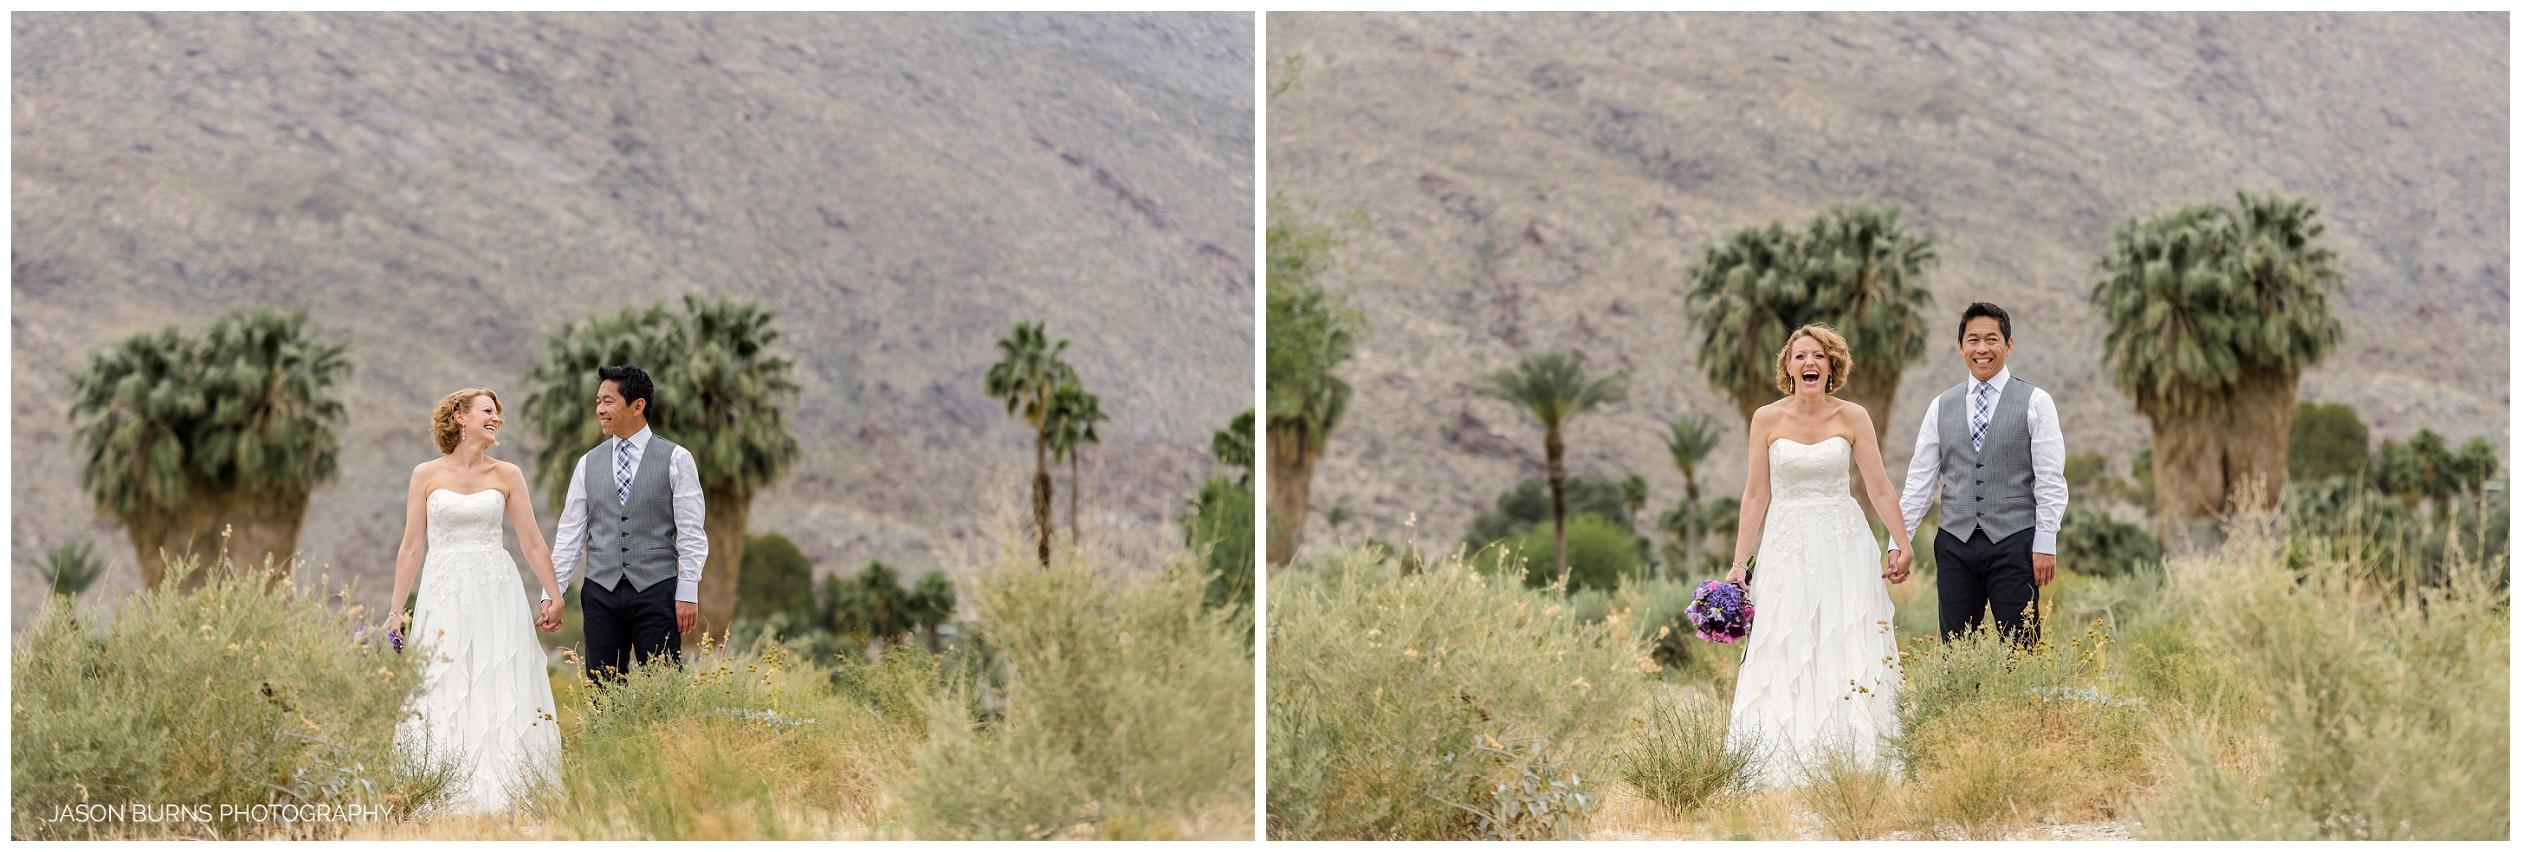 Palm Springs Wedding Photographer (14)